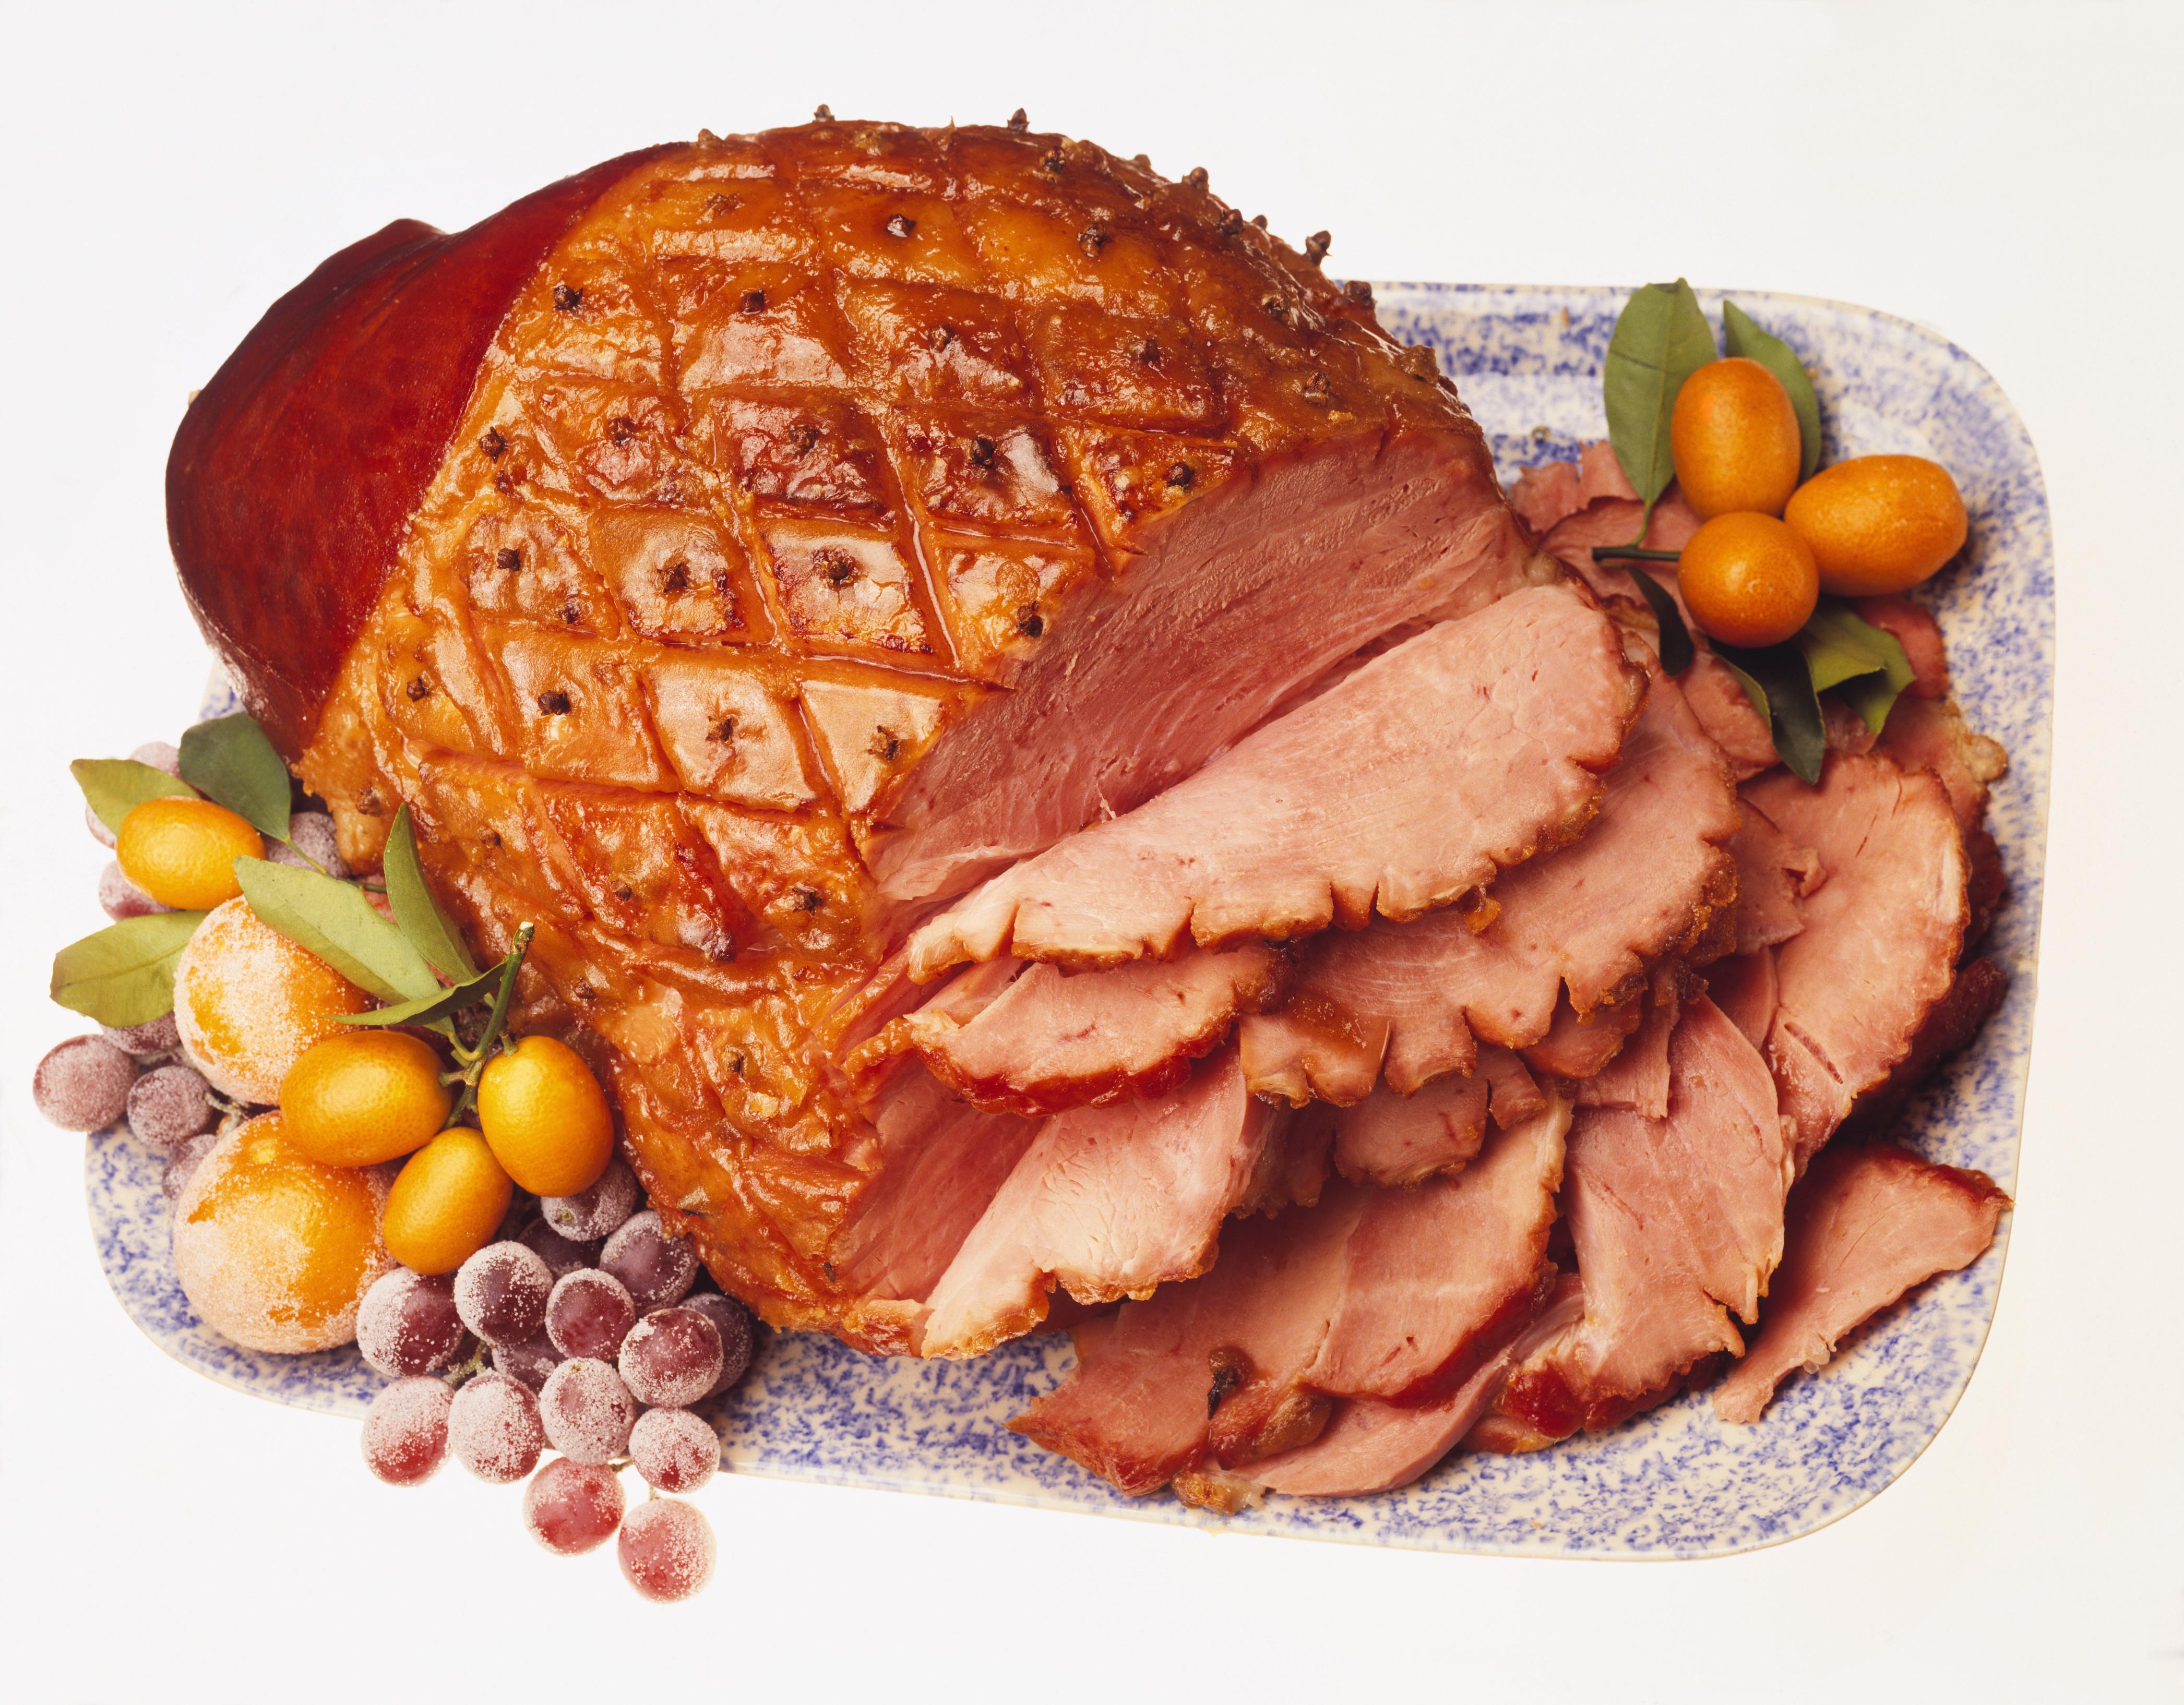 Easter Ham Recipe  Baked Easter Ham Recipe — Dishmaps